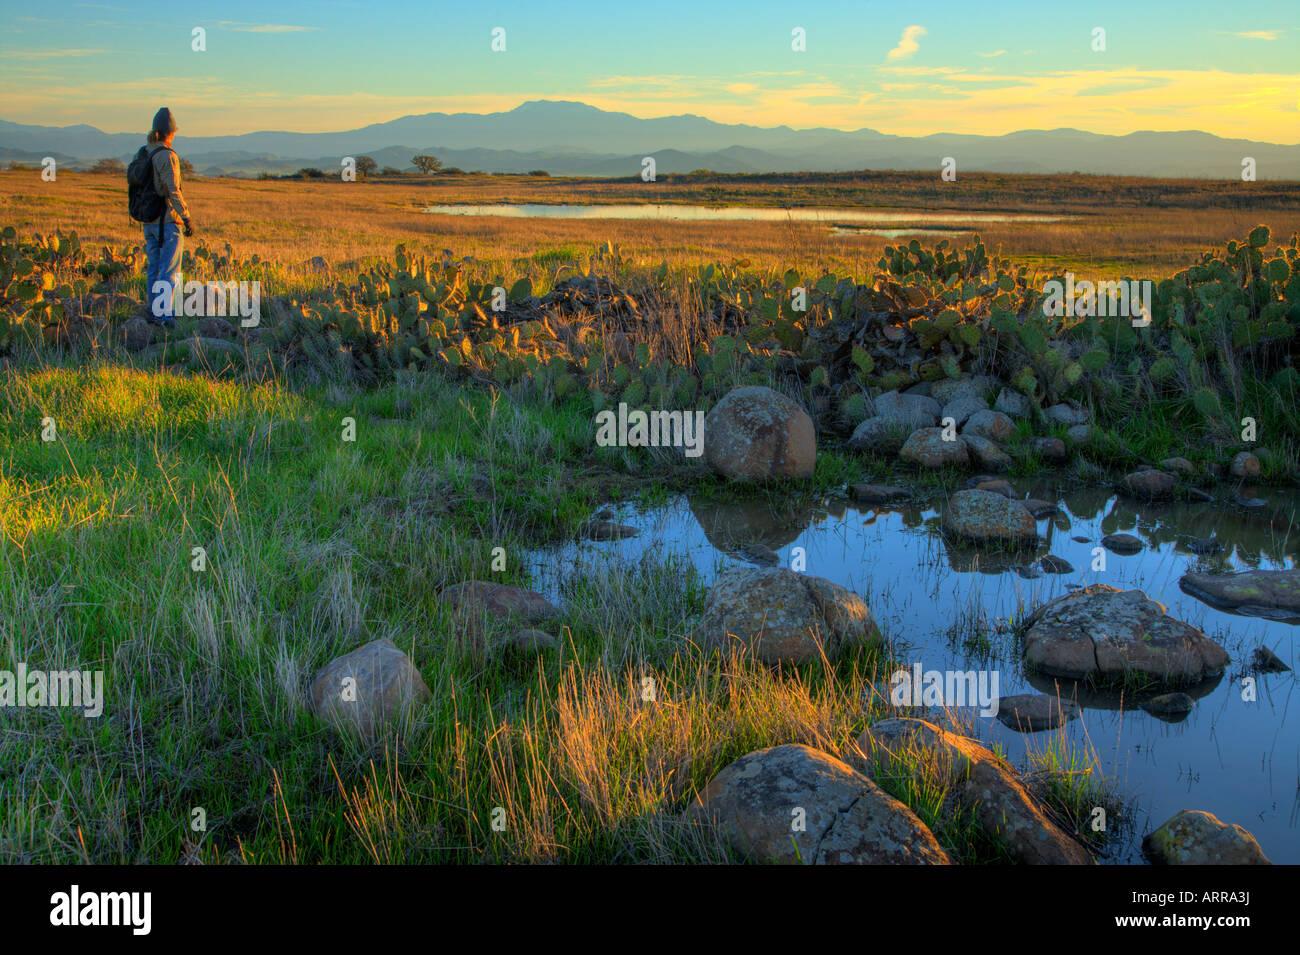 Early morining hiker at sunrise at the vernal pools Santa Rosa Plateau Ecological Reserve riverside county california Stock Photo